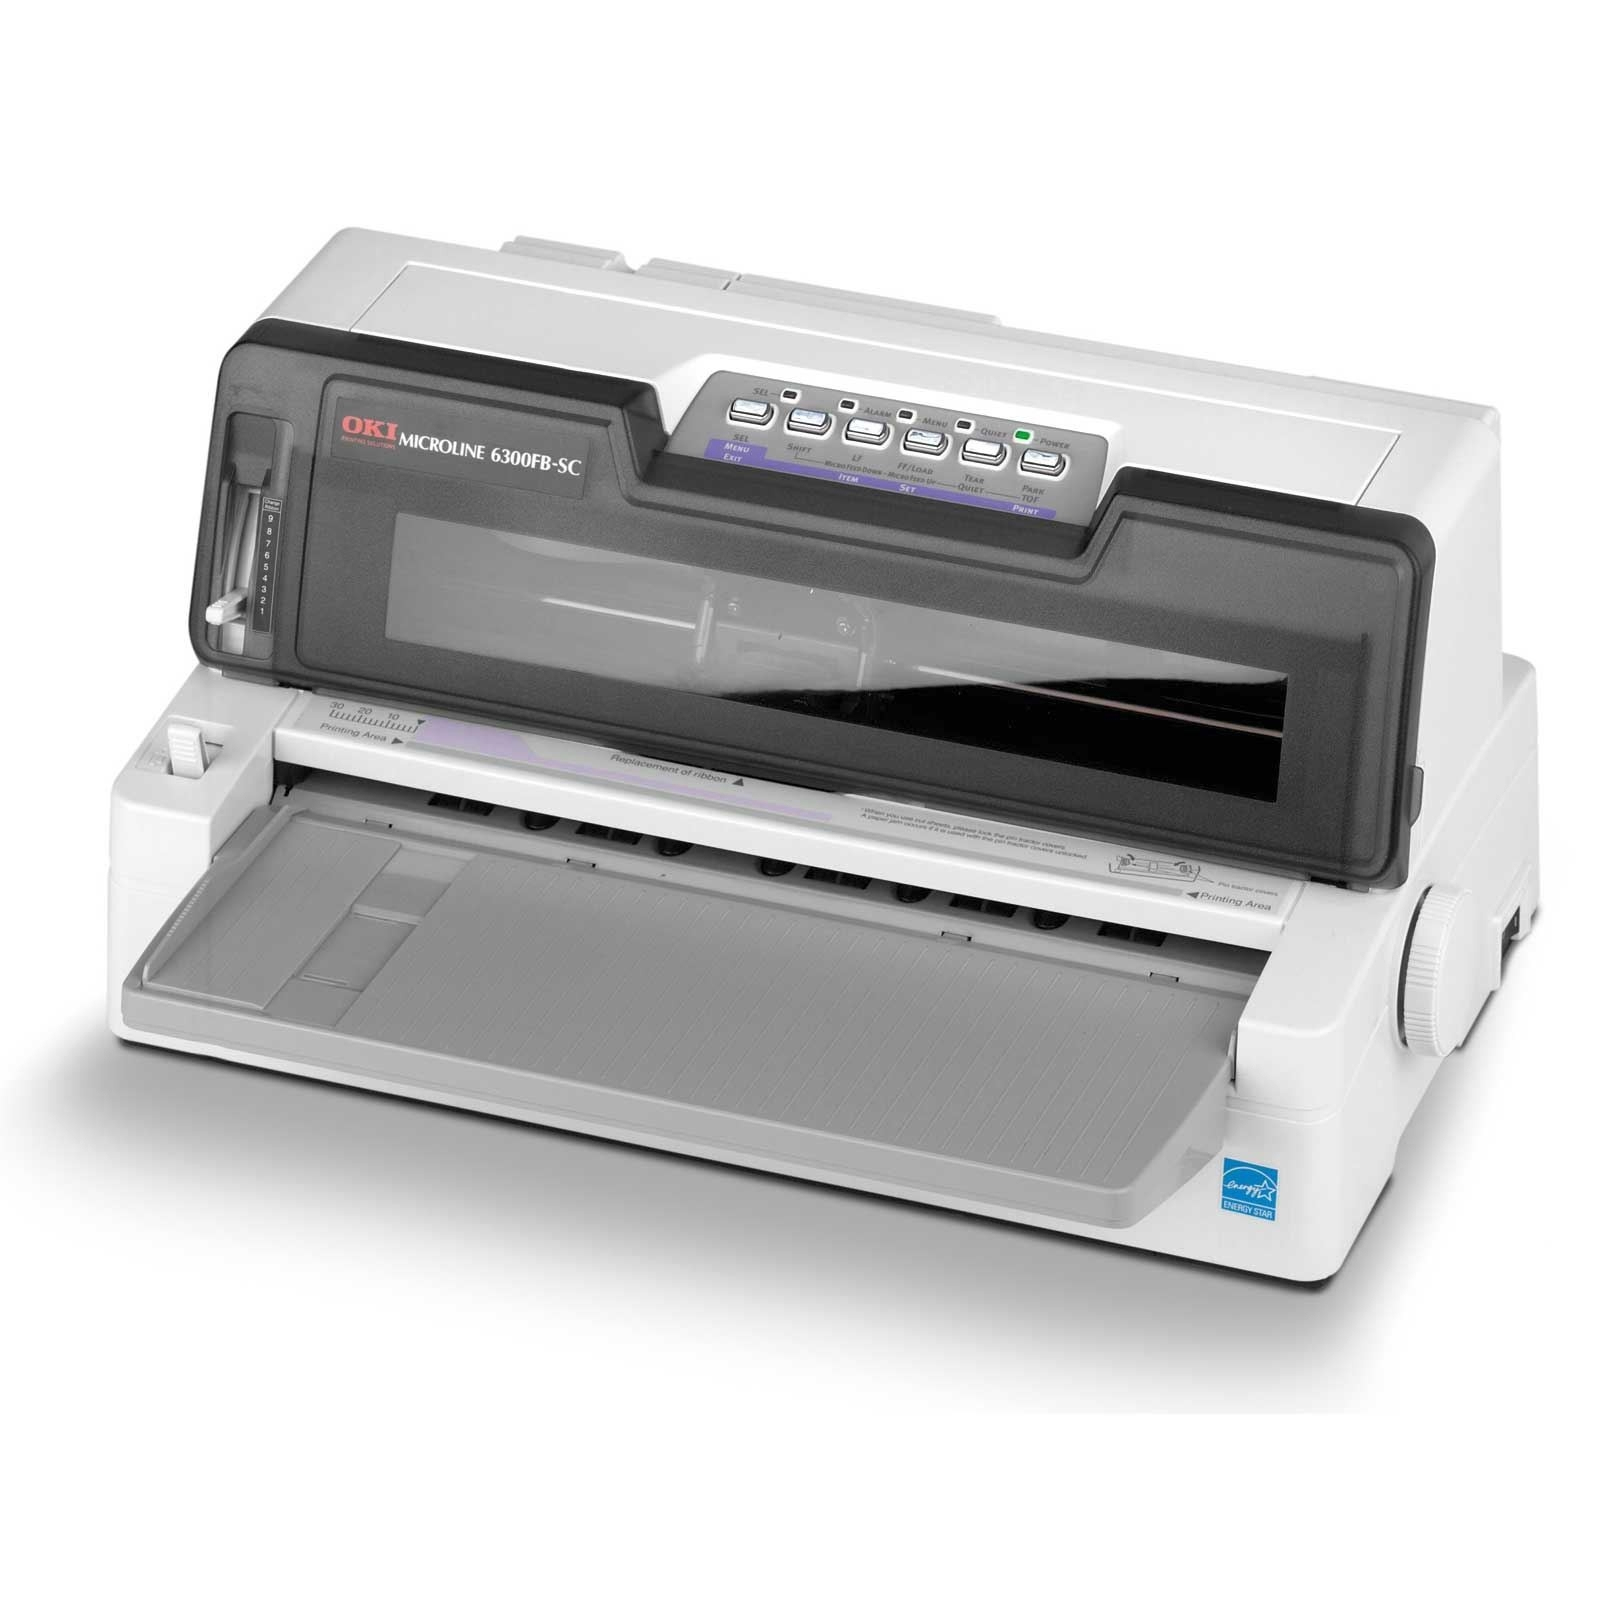 OKI ML6300 Mono 24 Pin Dot Matrix Printer, Print speed - fastest: 450, 360 x 360 dpi, 64KB memory, 3 year warranty (upon registration)